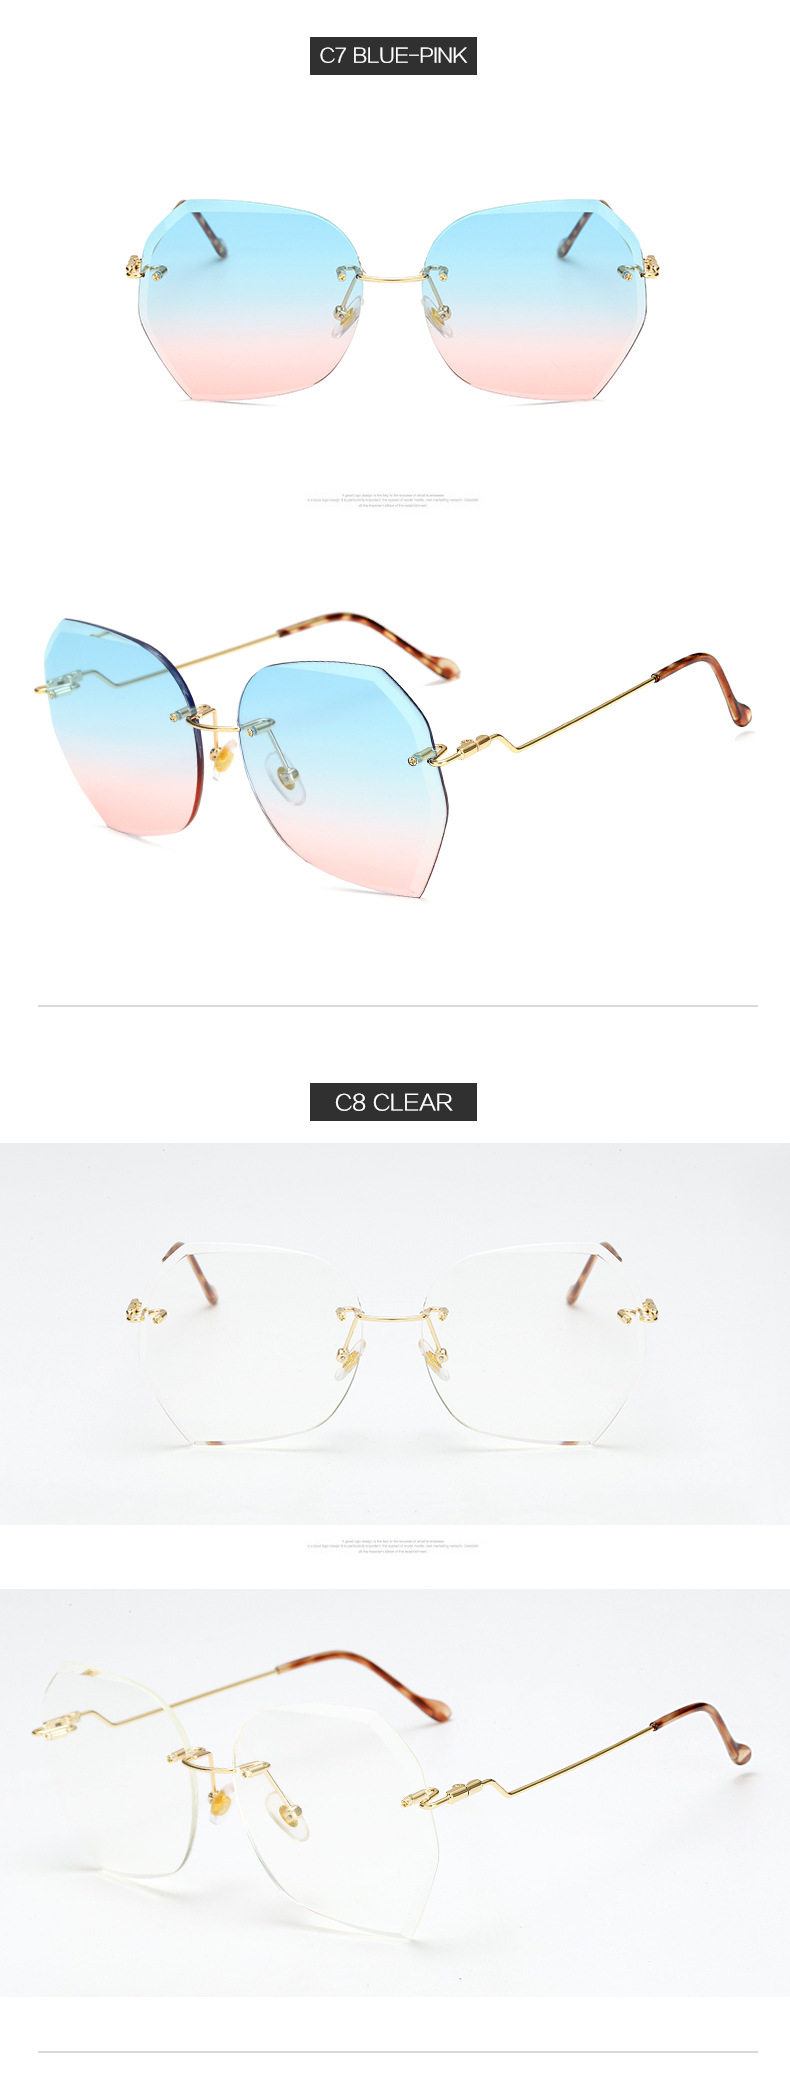 Apparel Accessories Straightforward Ladies 2018 Brand Designer Pink Blue Cat Eye Sunglasses Gold Metal Frame Uv400 Sun Glasses Polarized Sunglasses For Women Women's Glasses